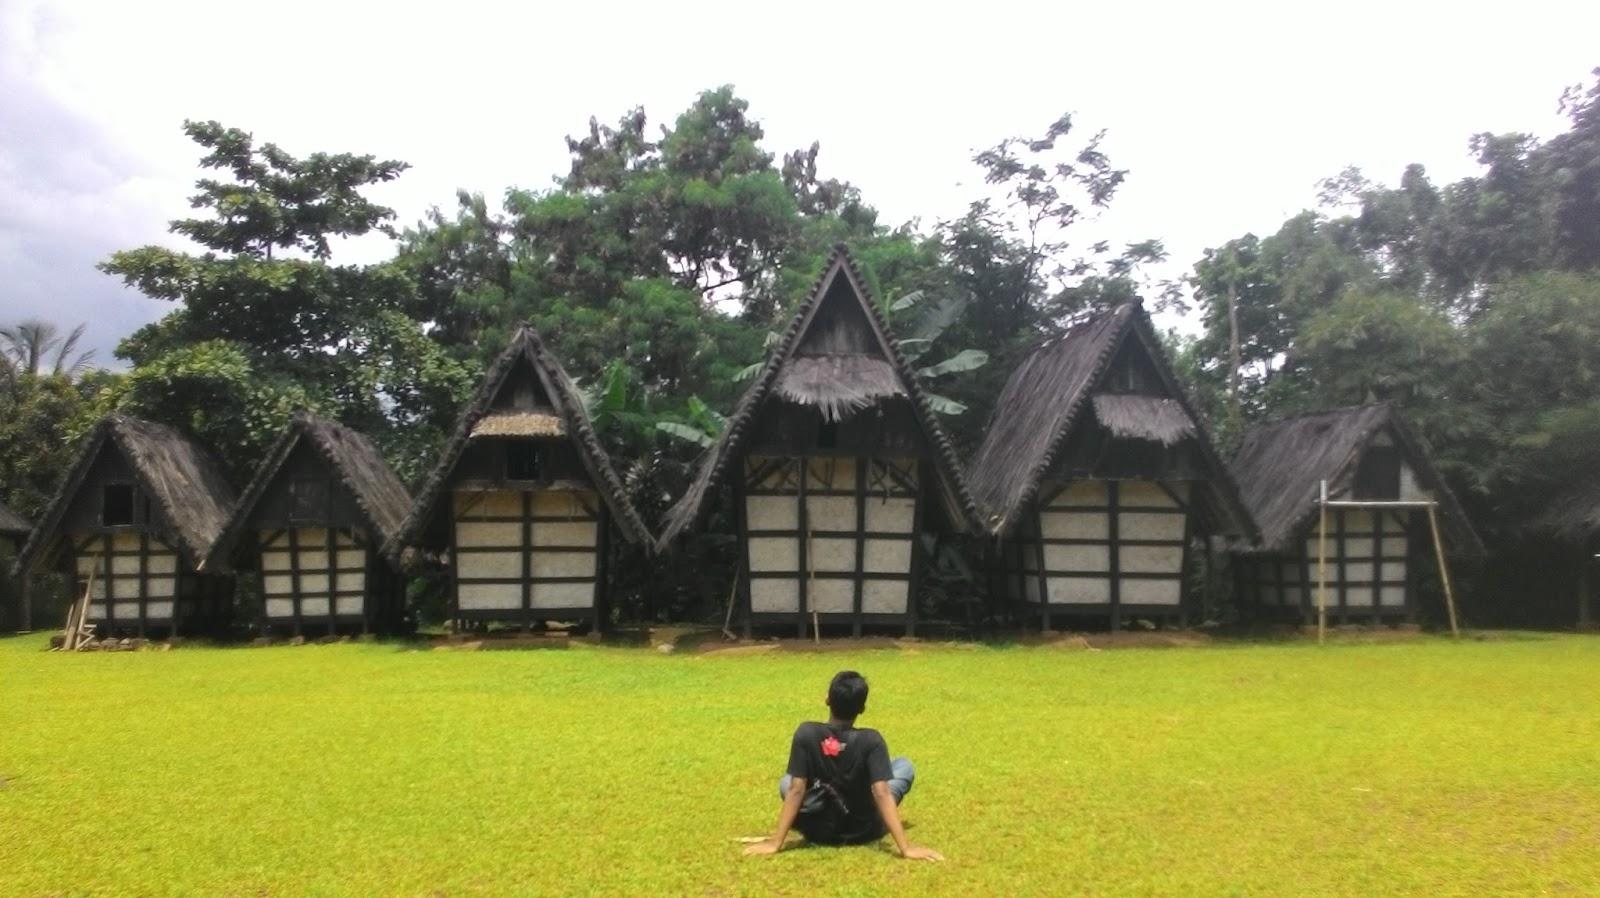 Kampung Budaya Sindang Barang Bogor Cocok Wisata Edukasi Bagi Ujung